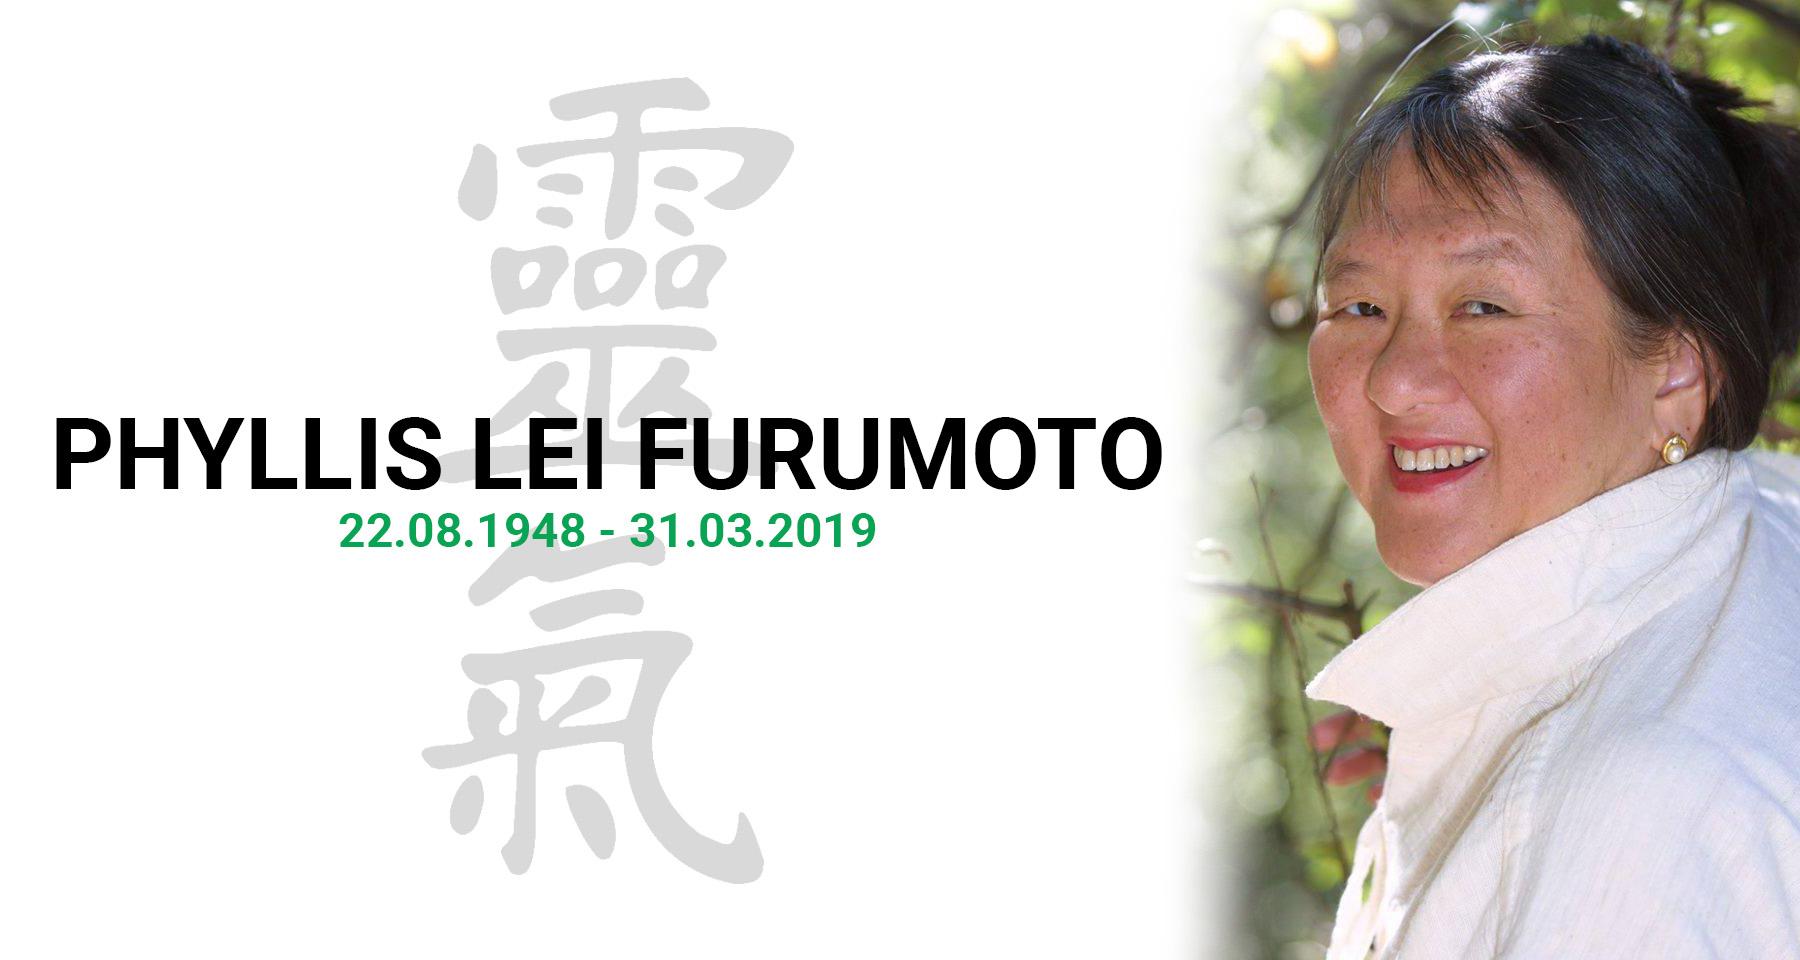 Passagem de Phyllis Lei Furumoto